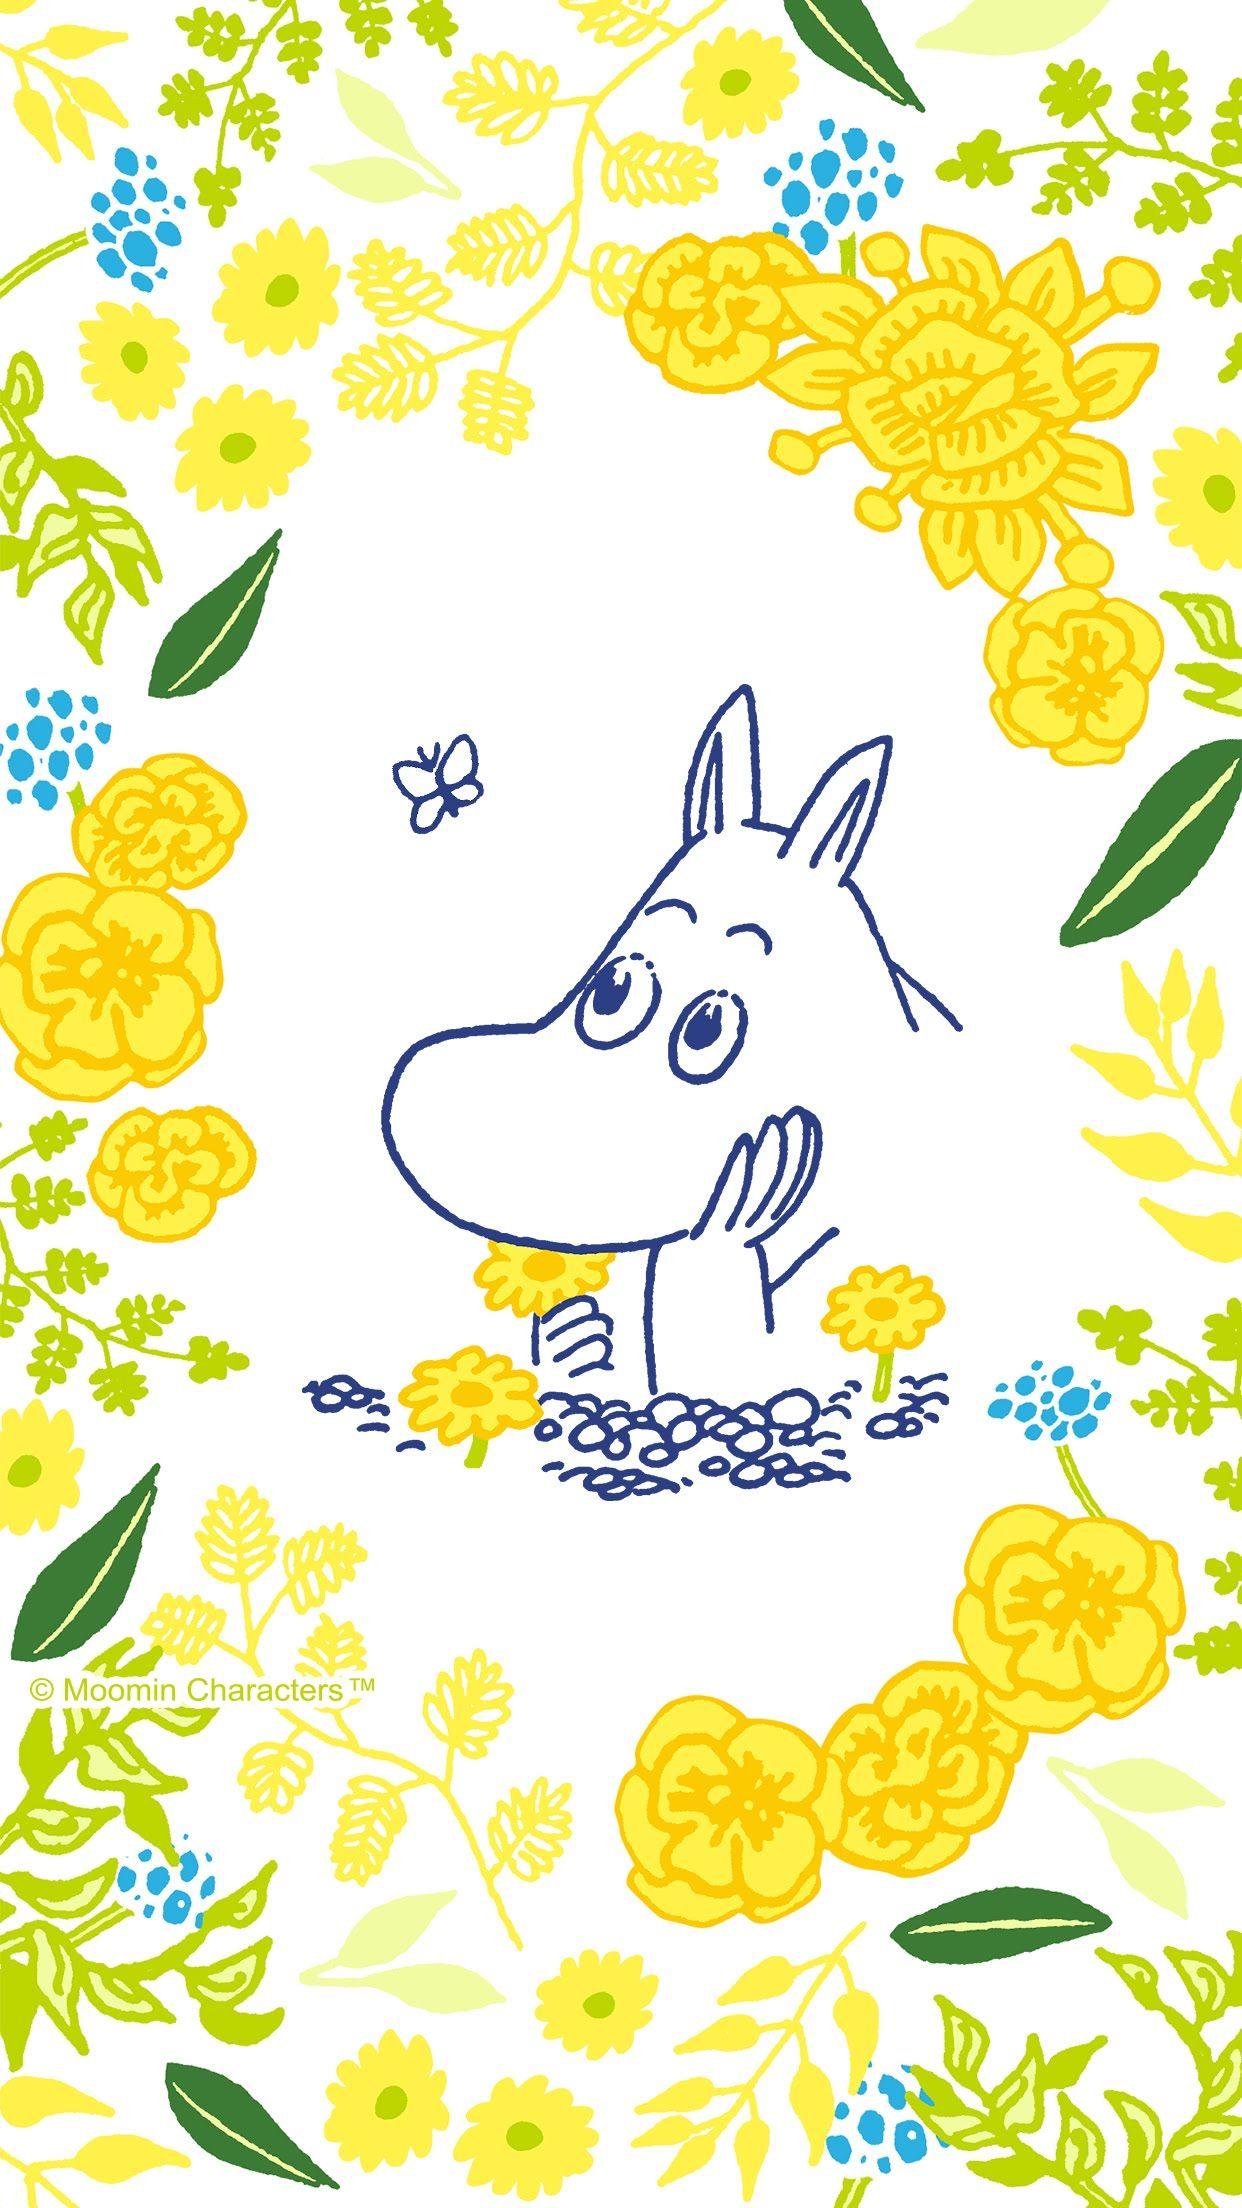 Mummitrolli おしゃれまとめの人気アイデア Pinterest Nataliyanikskaya ムーミン イラスト ムーミン 壁紙 花 イラスト